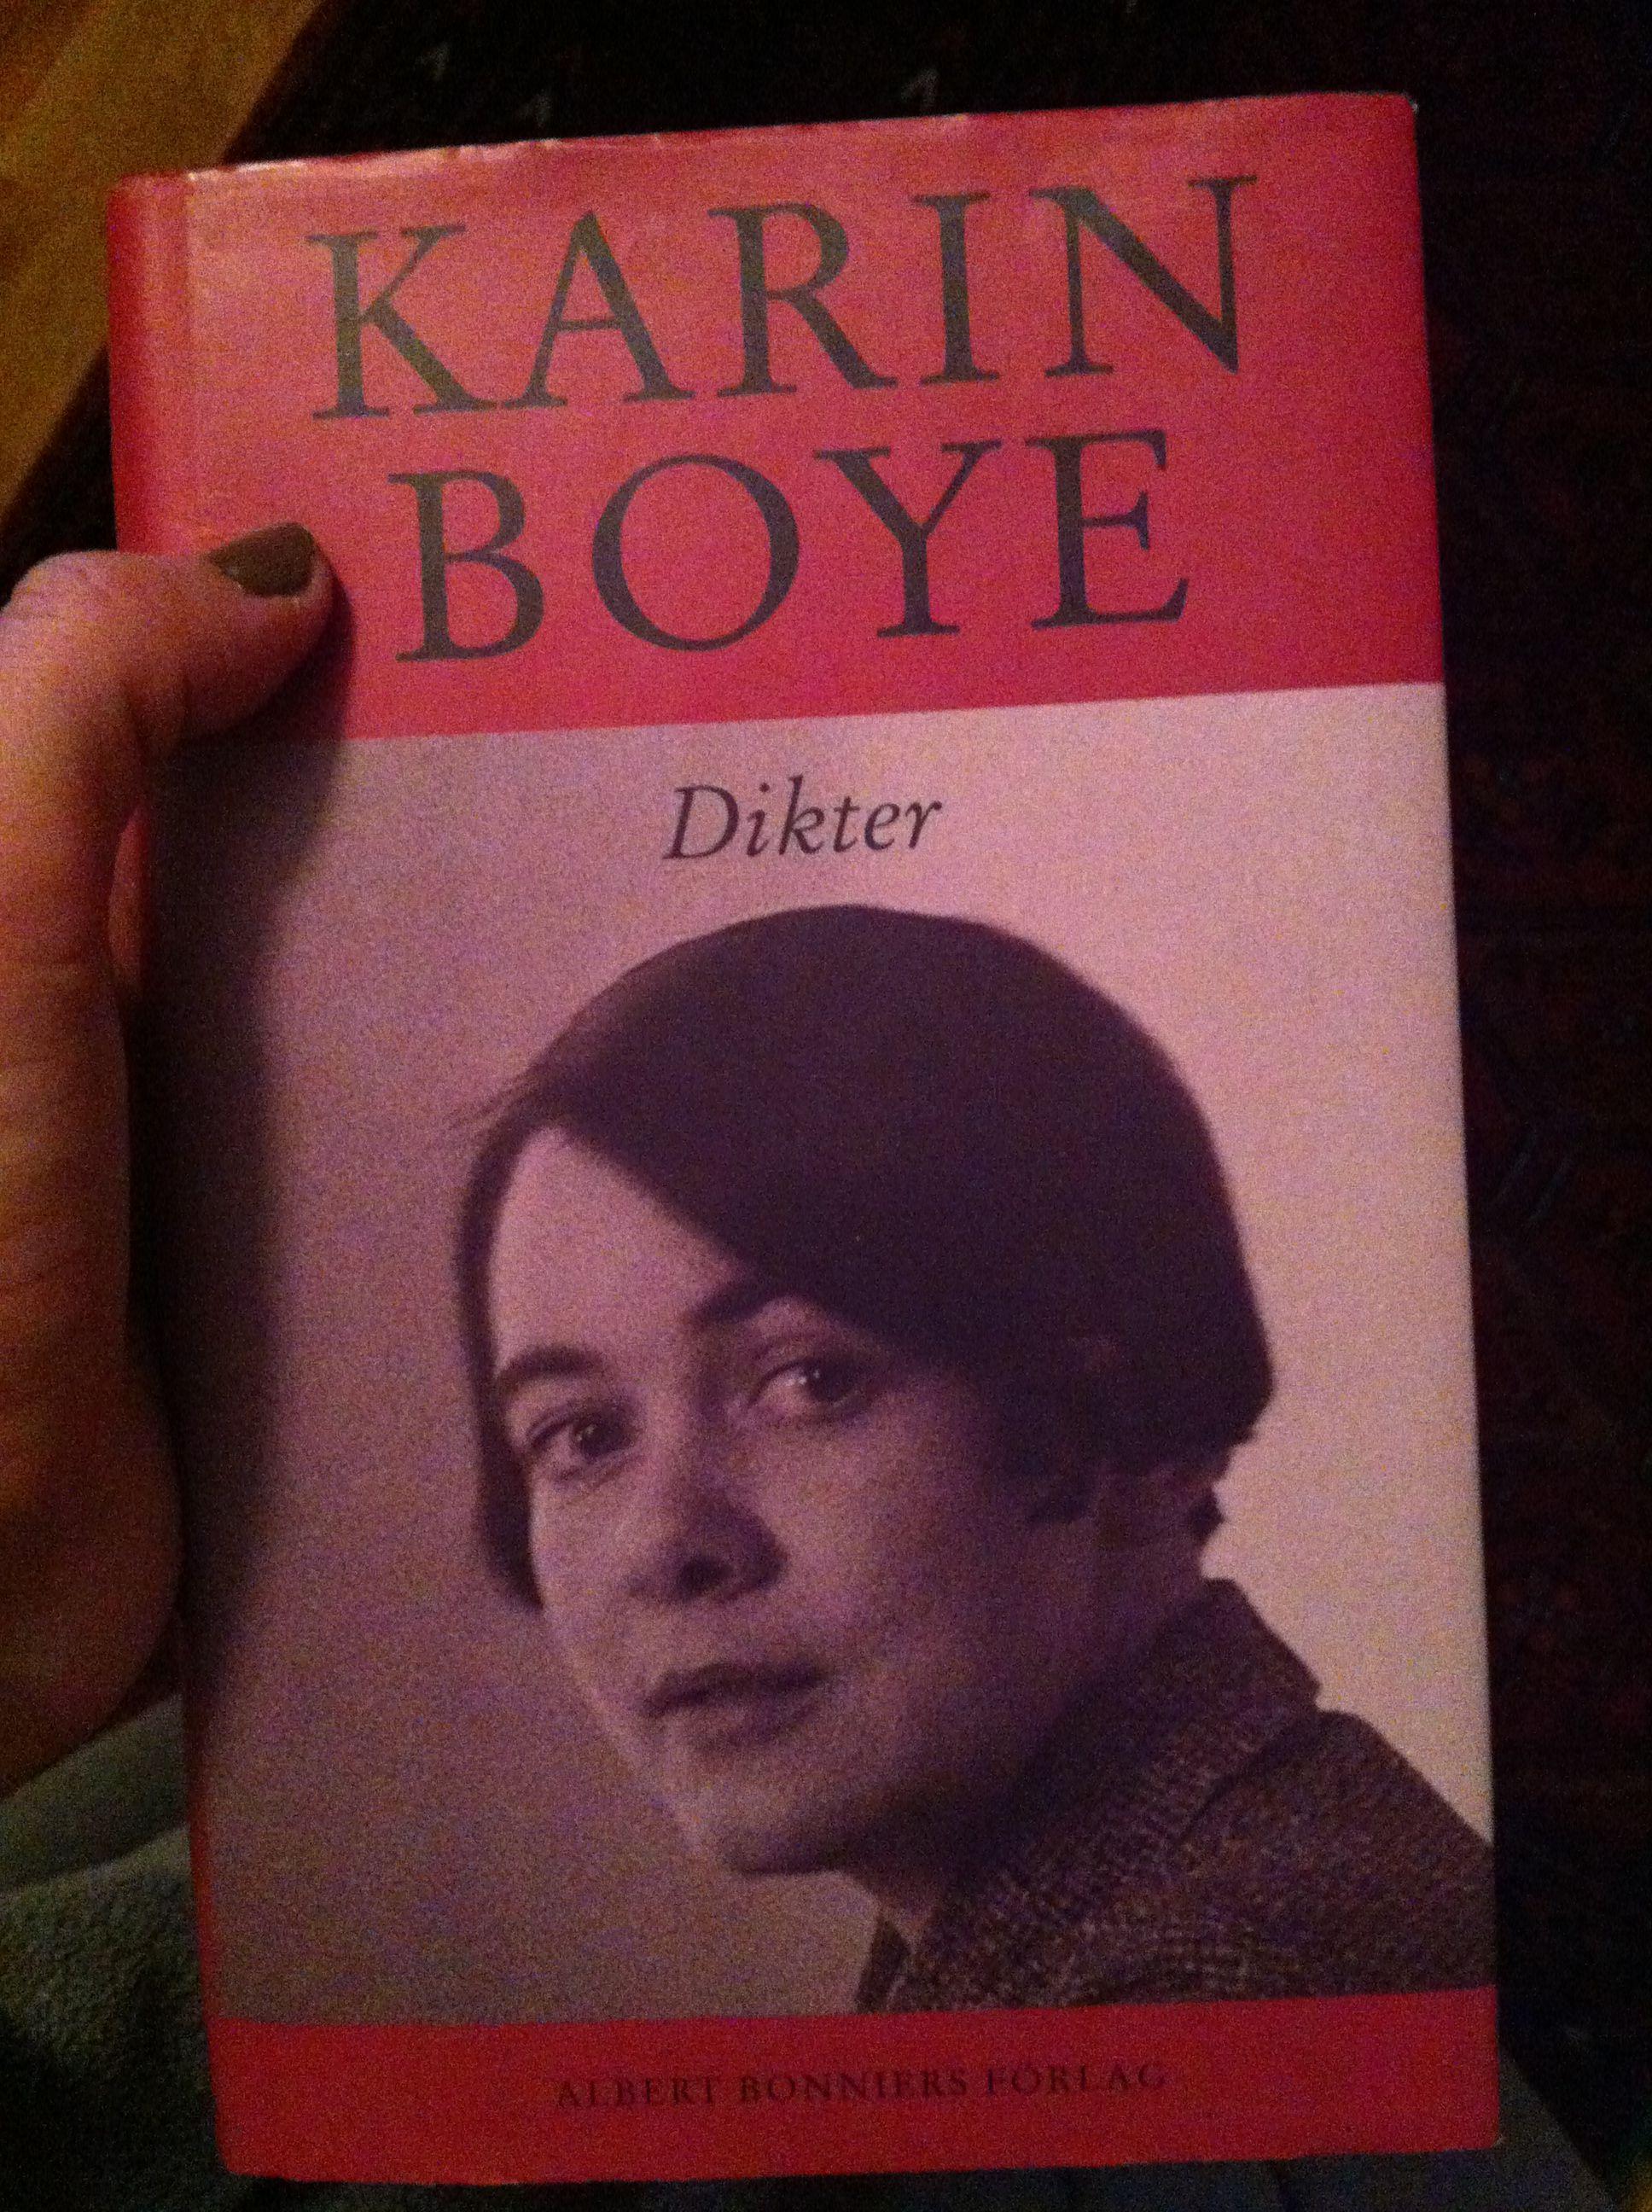 Karin Boye. Oh vad hon hjälpte mig genom tonårskvalen.